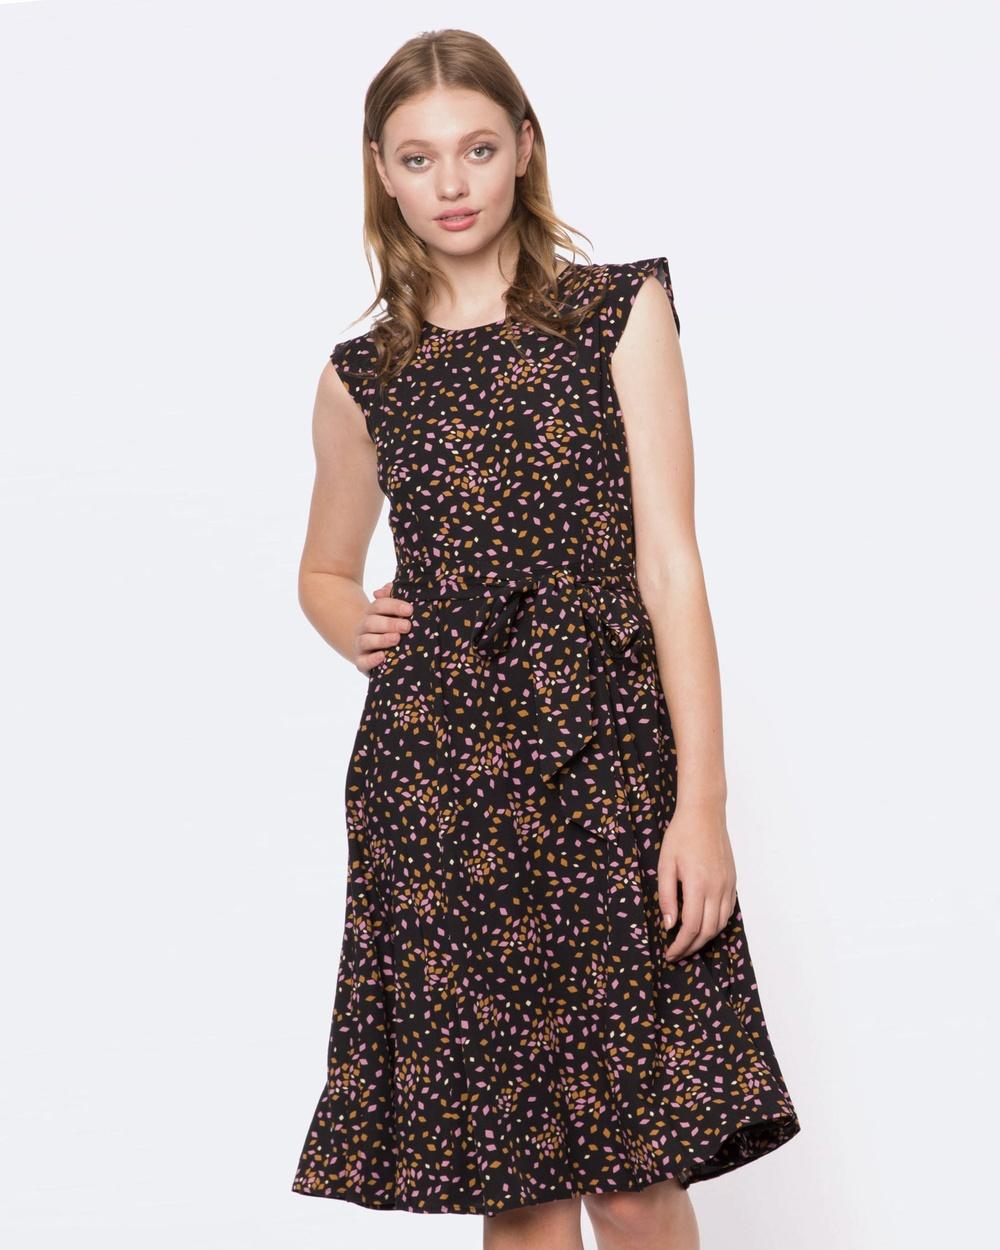 Princess Highway Chloe Dress Printed Dresses Black Chloe Dress